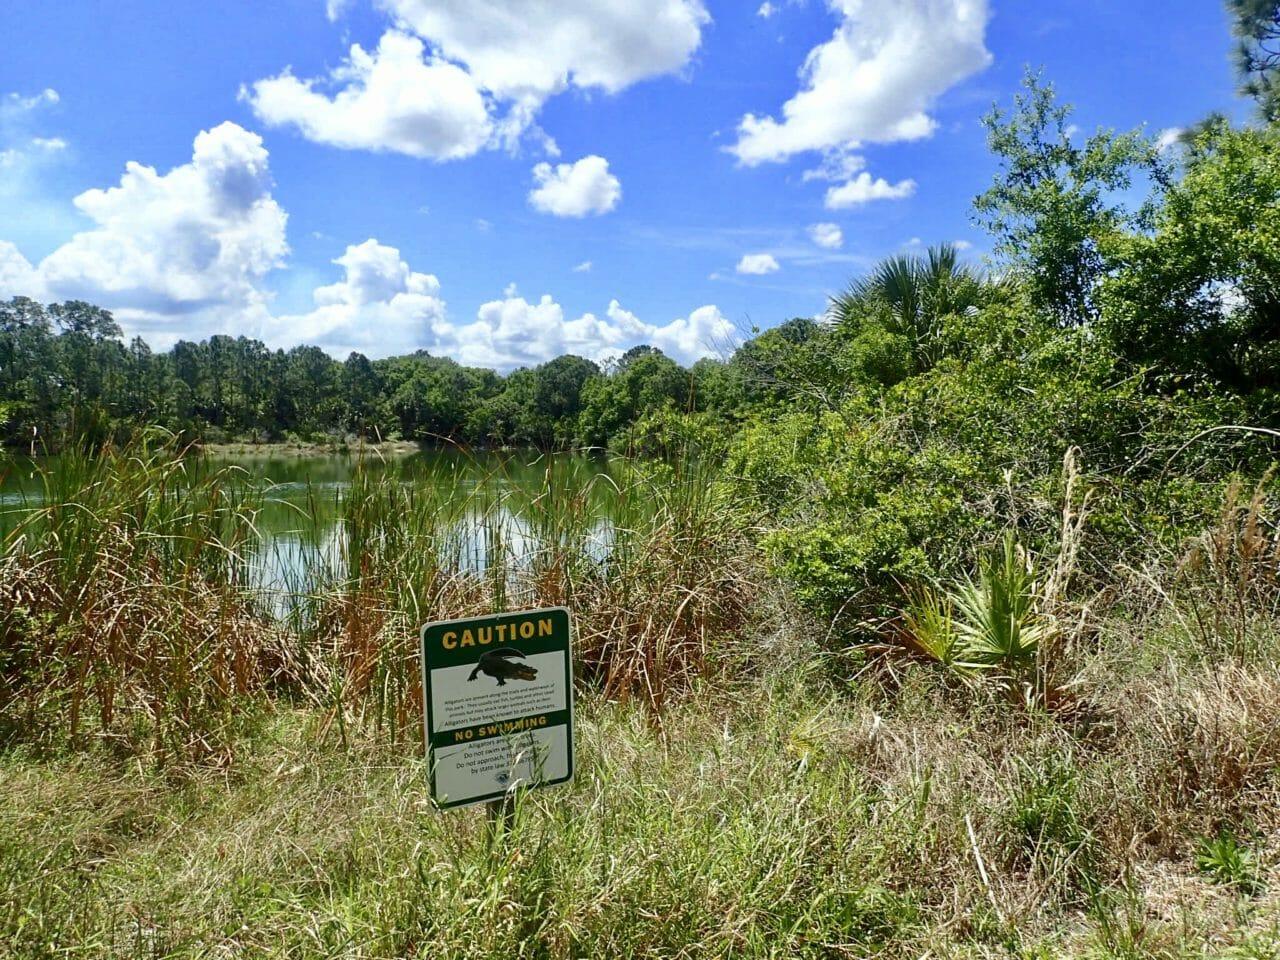 Alligator warning sign